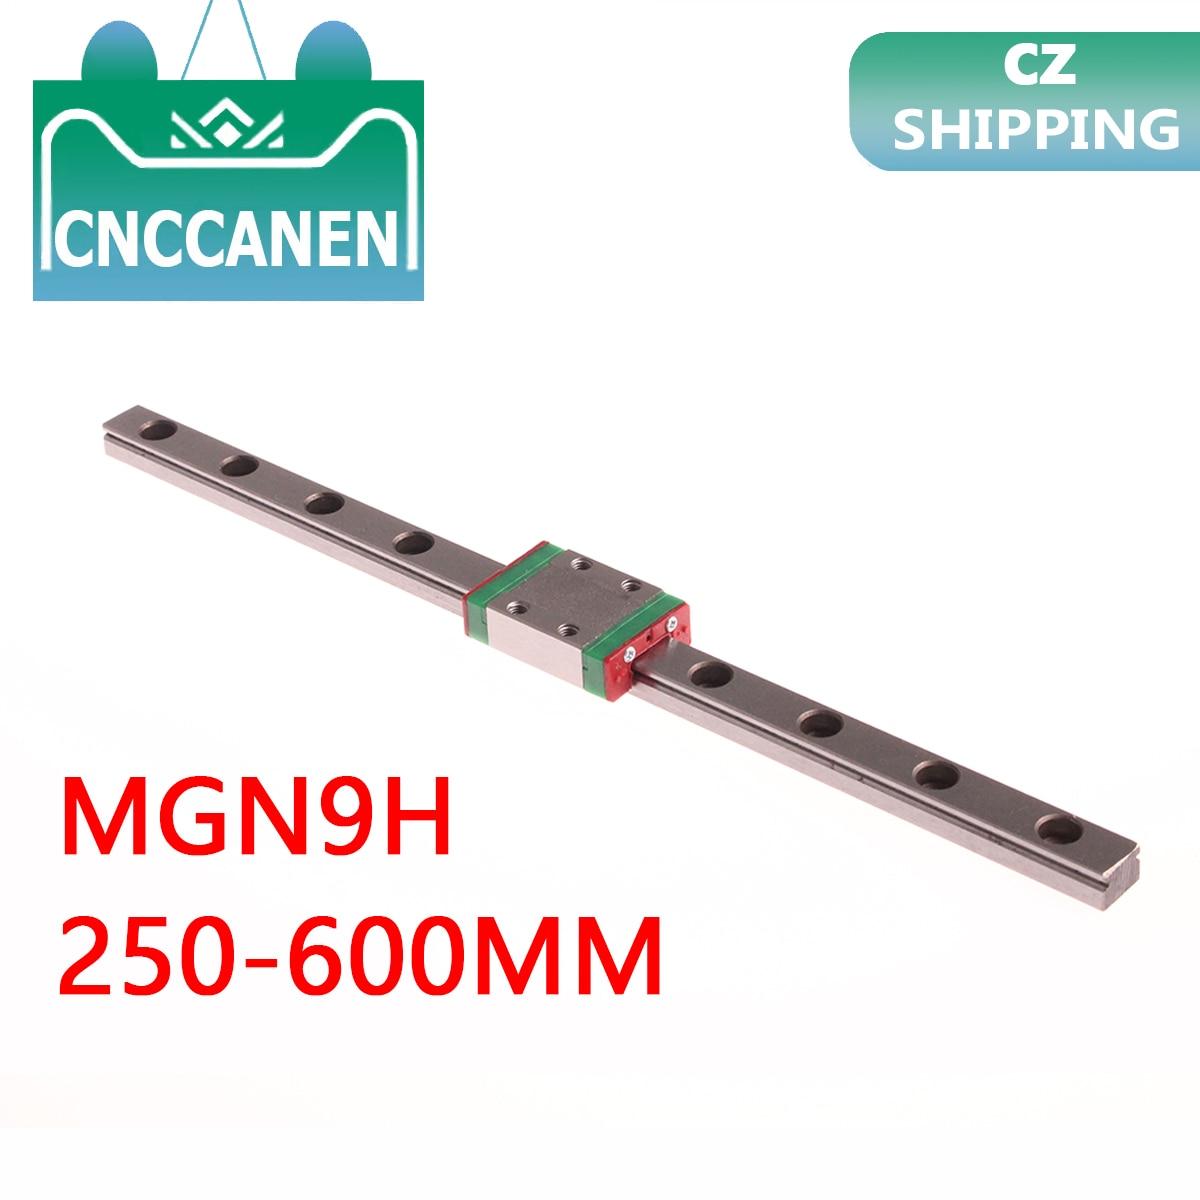 MGN9 Miniature Linear Rail Slide 250/300/350/400/450/500/550/600mm 1PCS MGN Linear Guide + MGN9H Carriage Block CNC 3D Printer